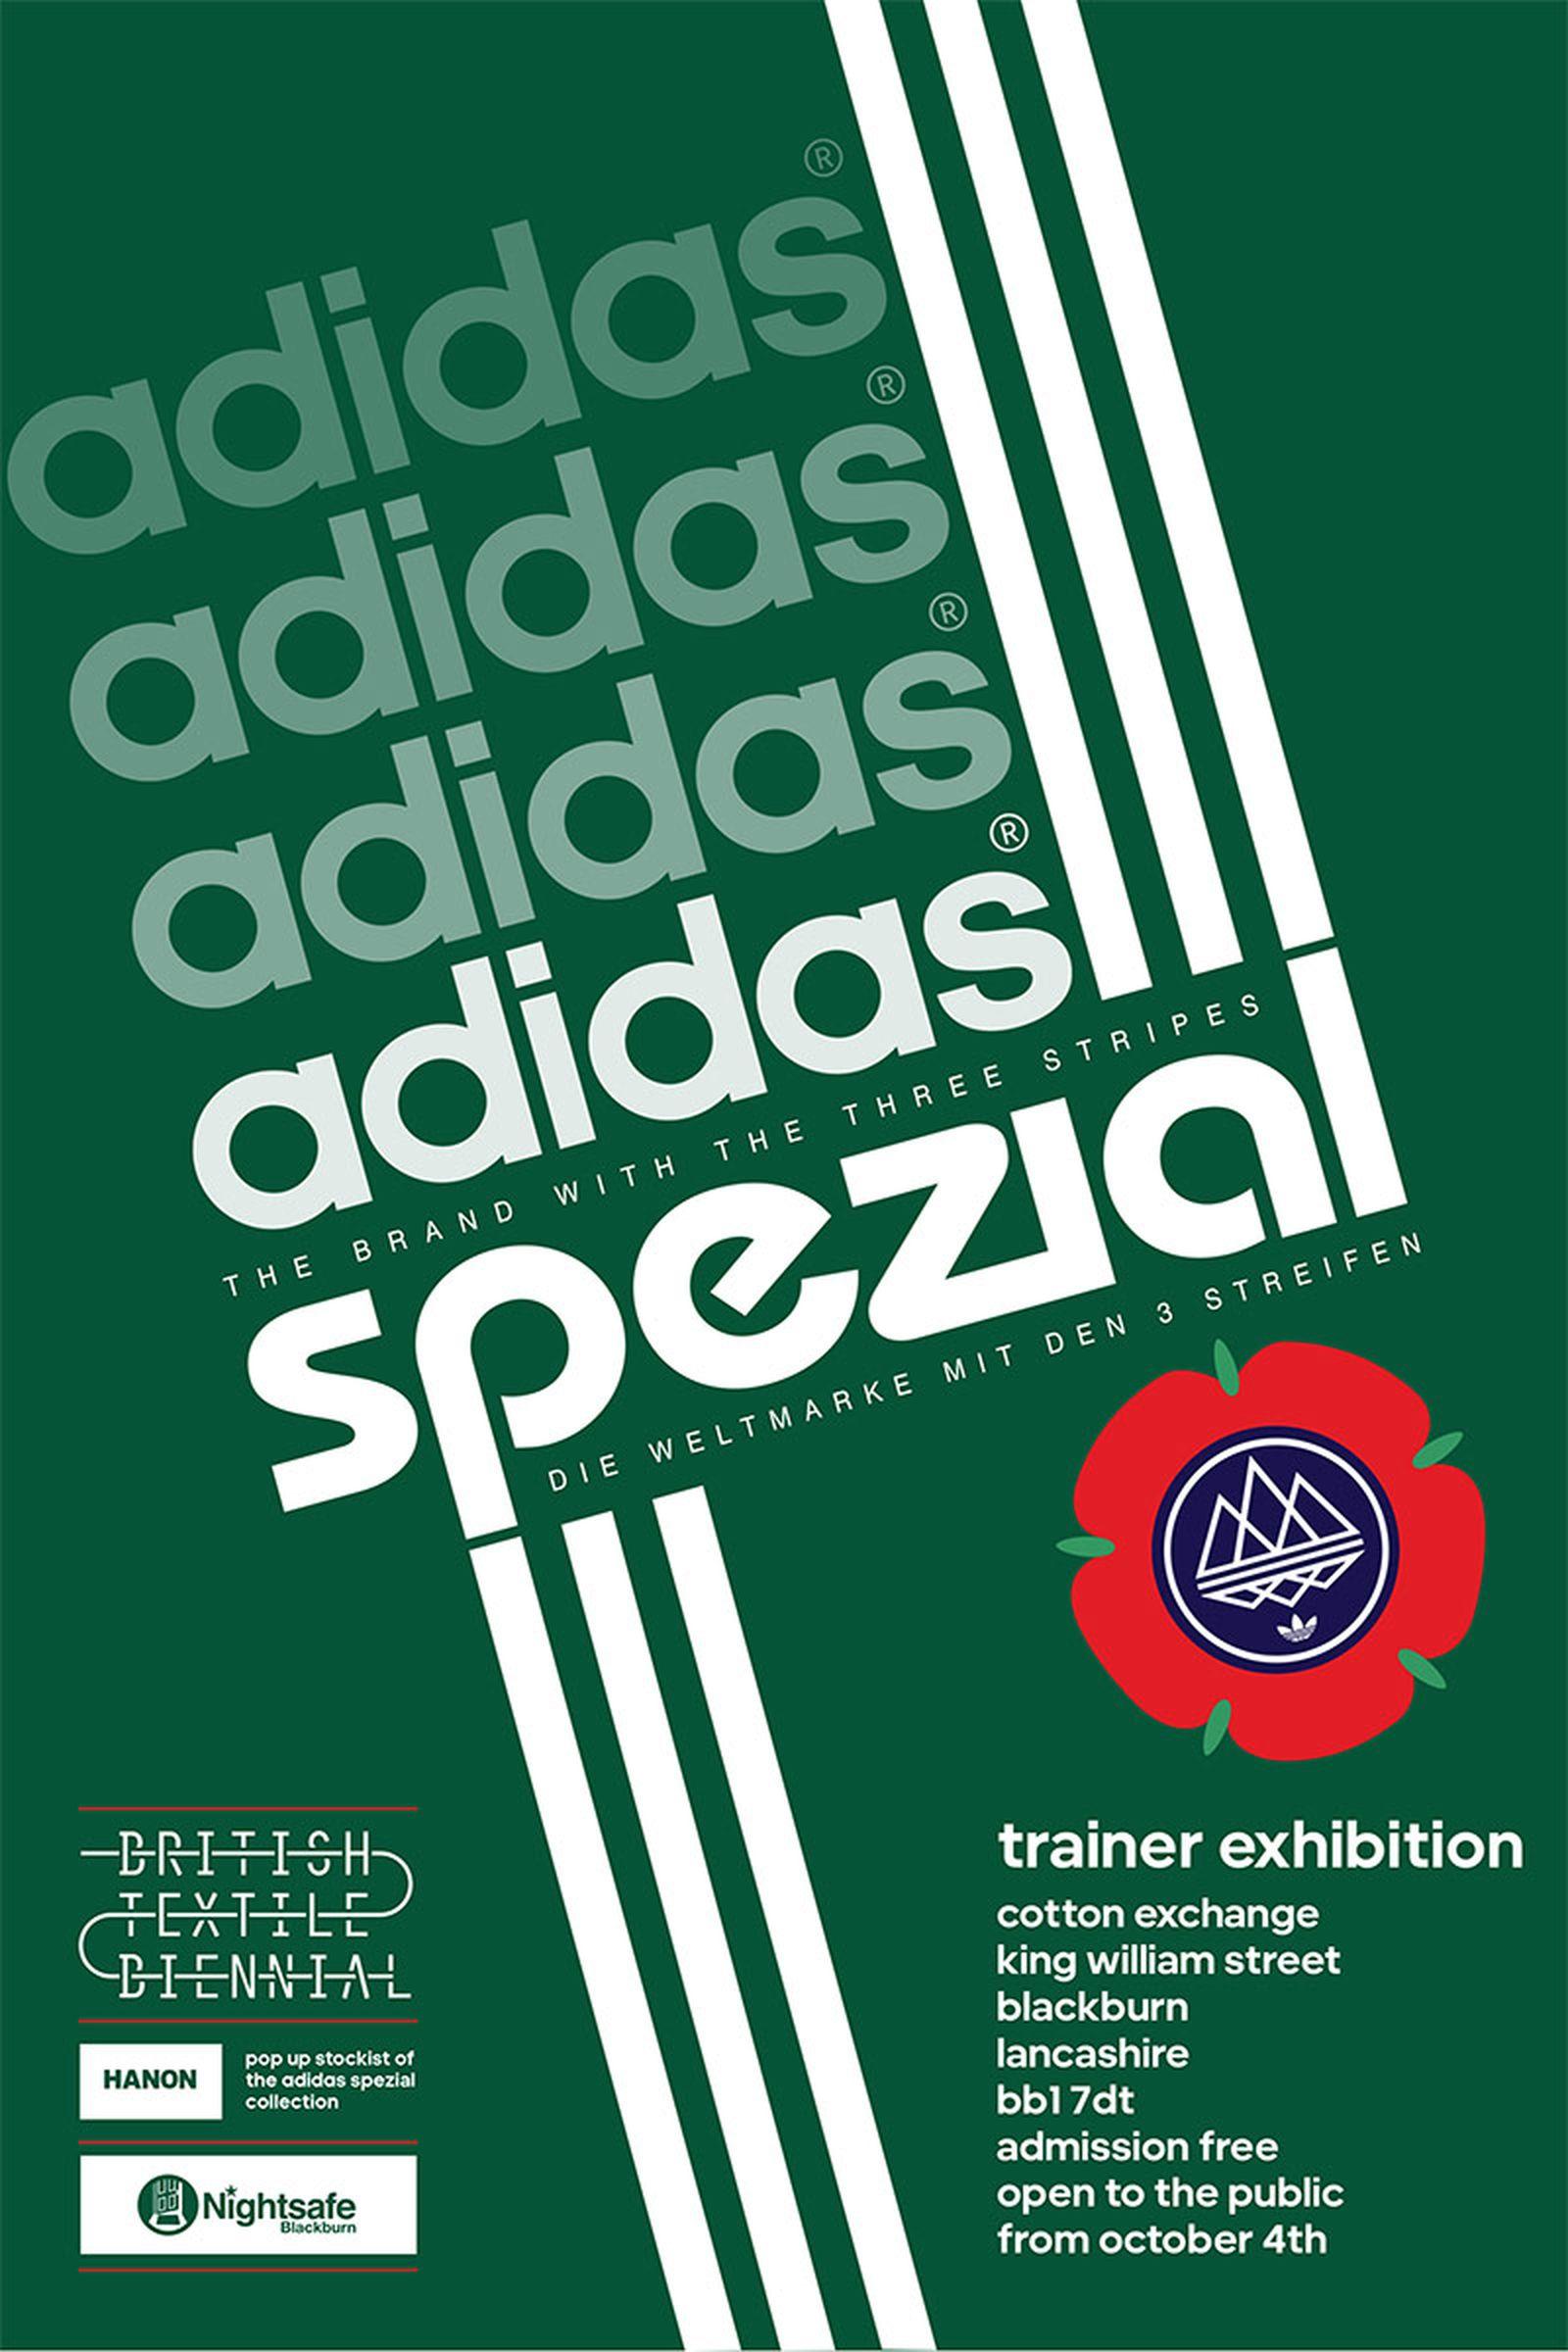 adidas blackburn spezial exhibition flyer